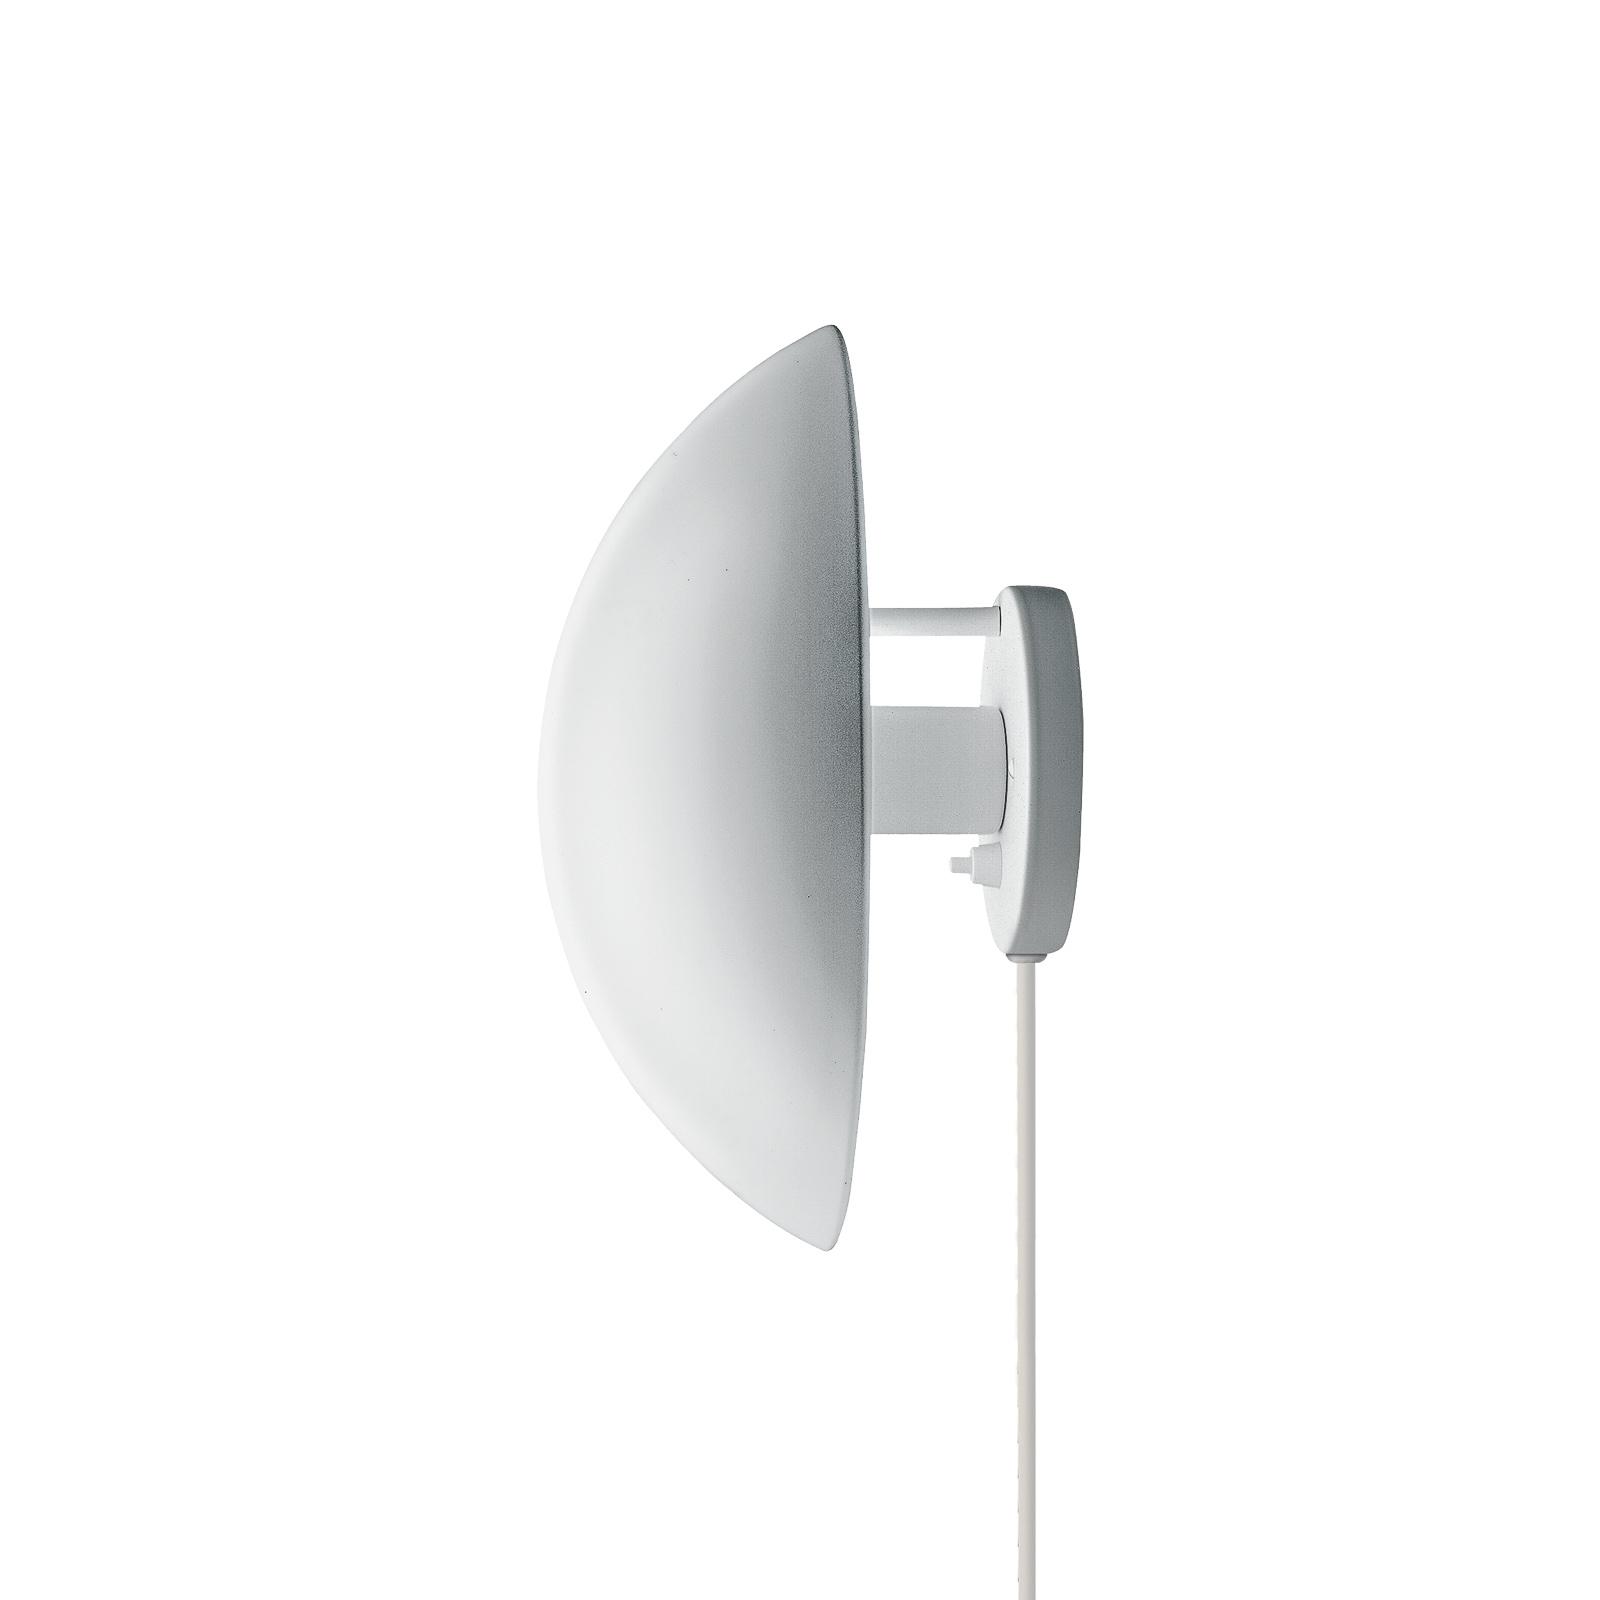 Louis Poulsen PH Hat wandlamp met stekker